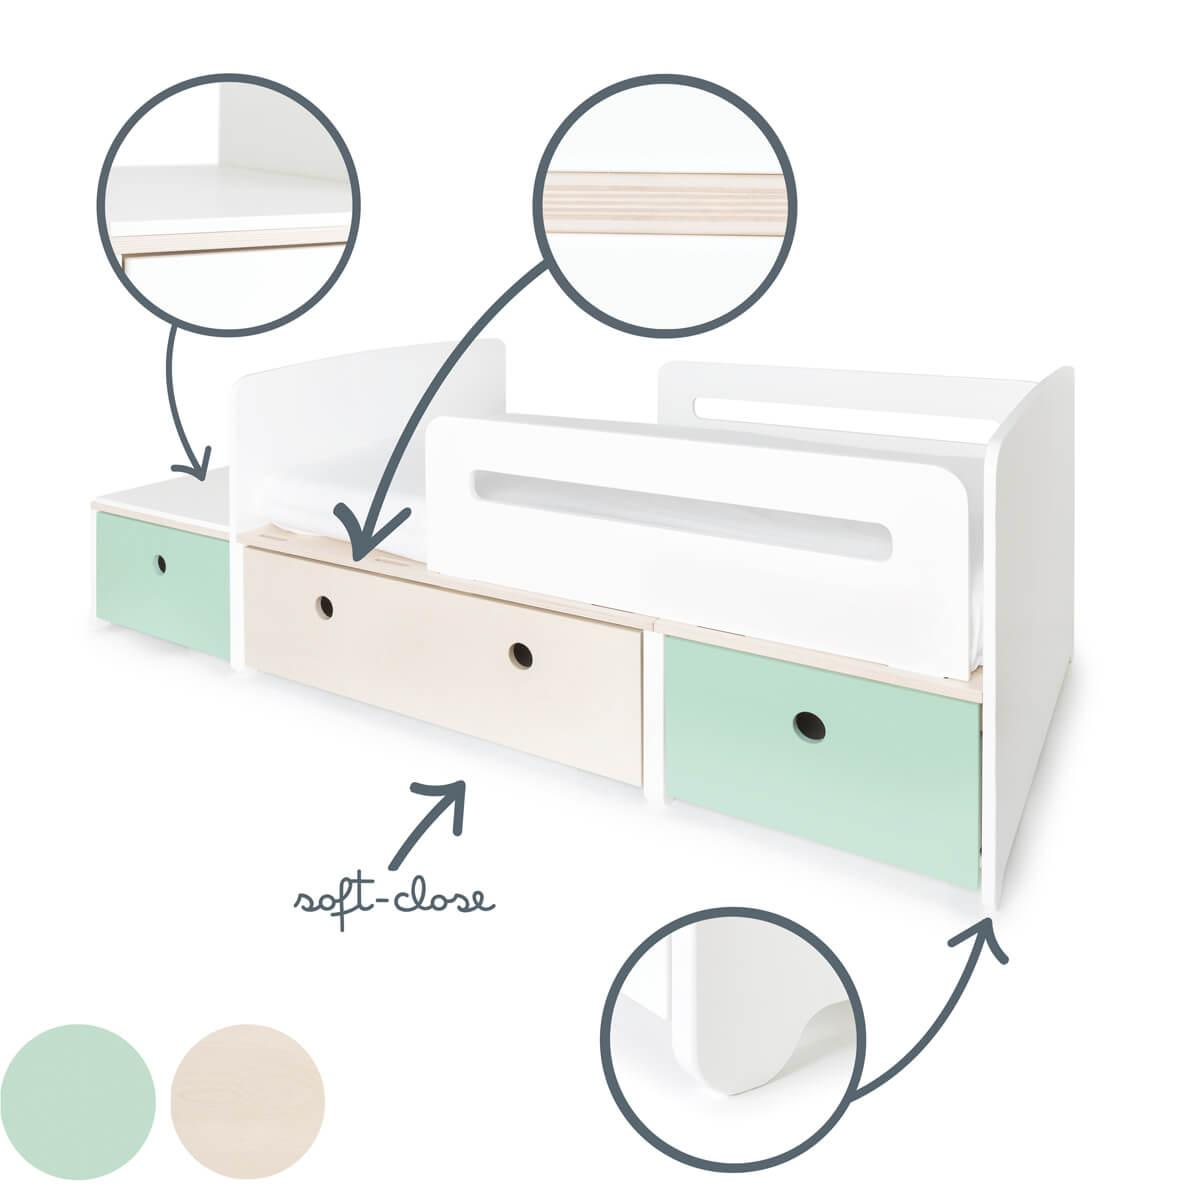 Cama evolutiva infantil 90x150/200cm COLORFLEX Abitare Kids mint-white wash-mint